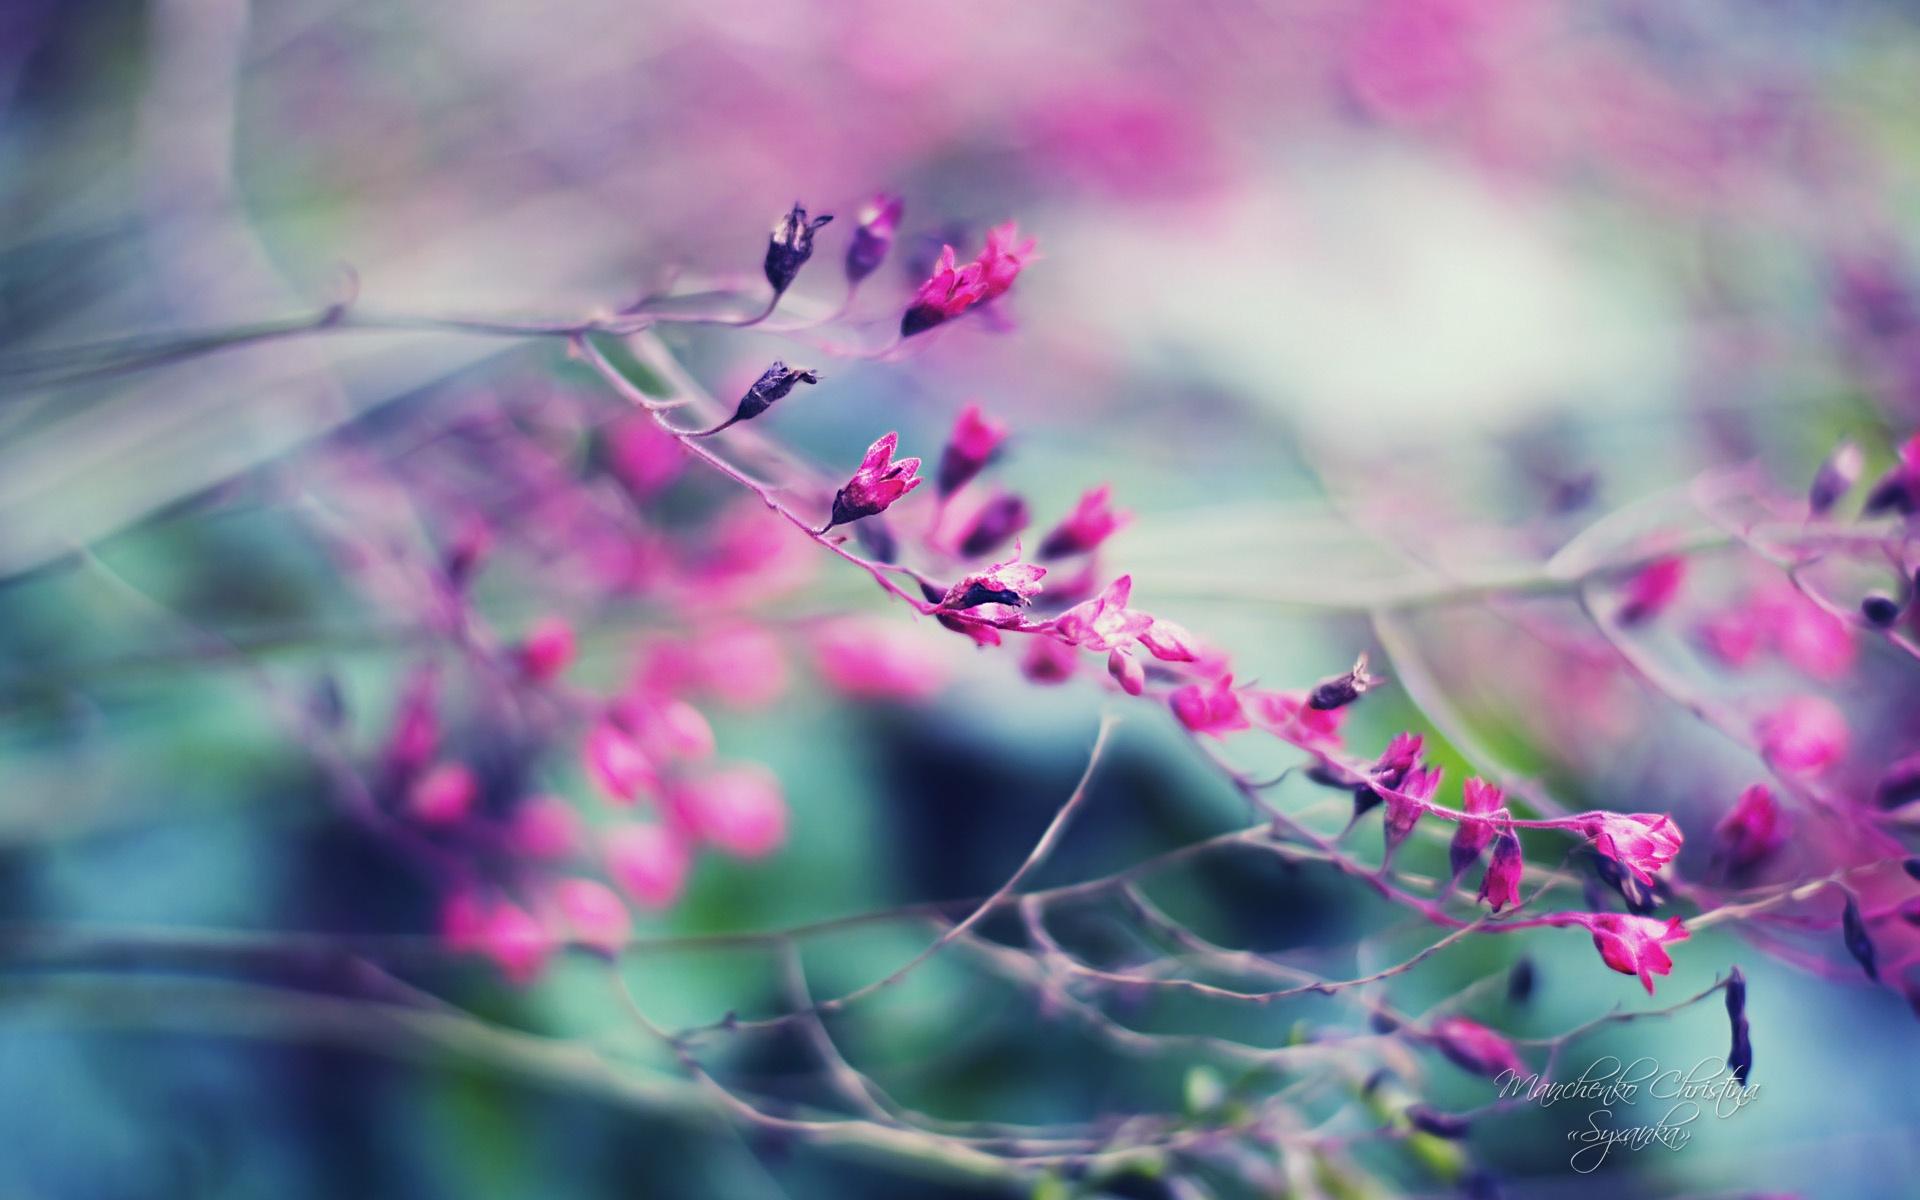 Sfondi hd bellissimi fiore viola sfondi hd gratis for Sfondi hd viola